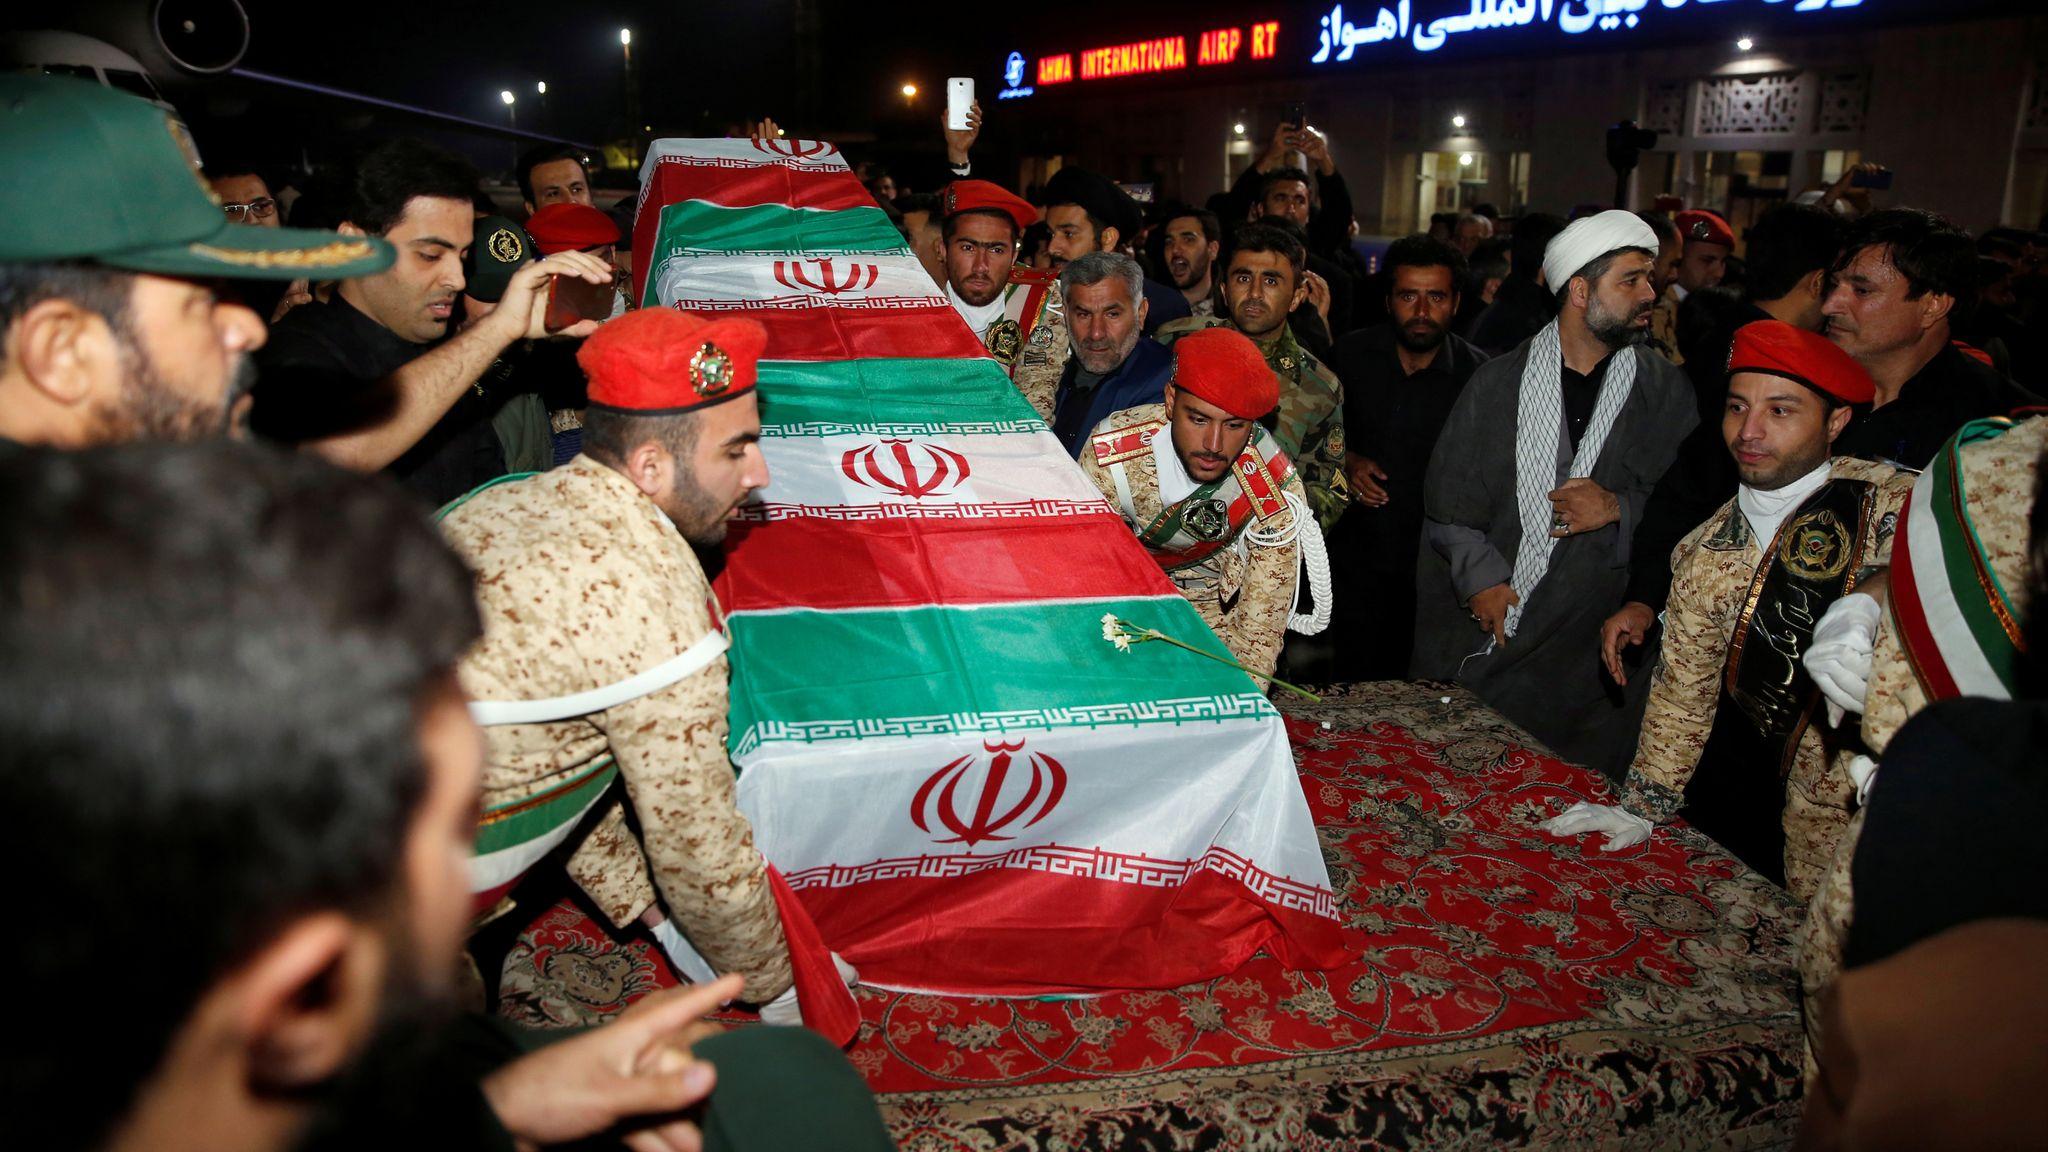 Iran crisis: Trump described as a 'terrorist in a suit' as aggression escalates